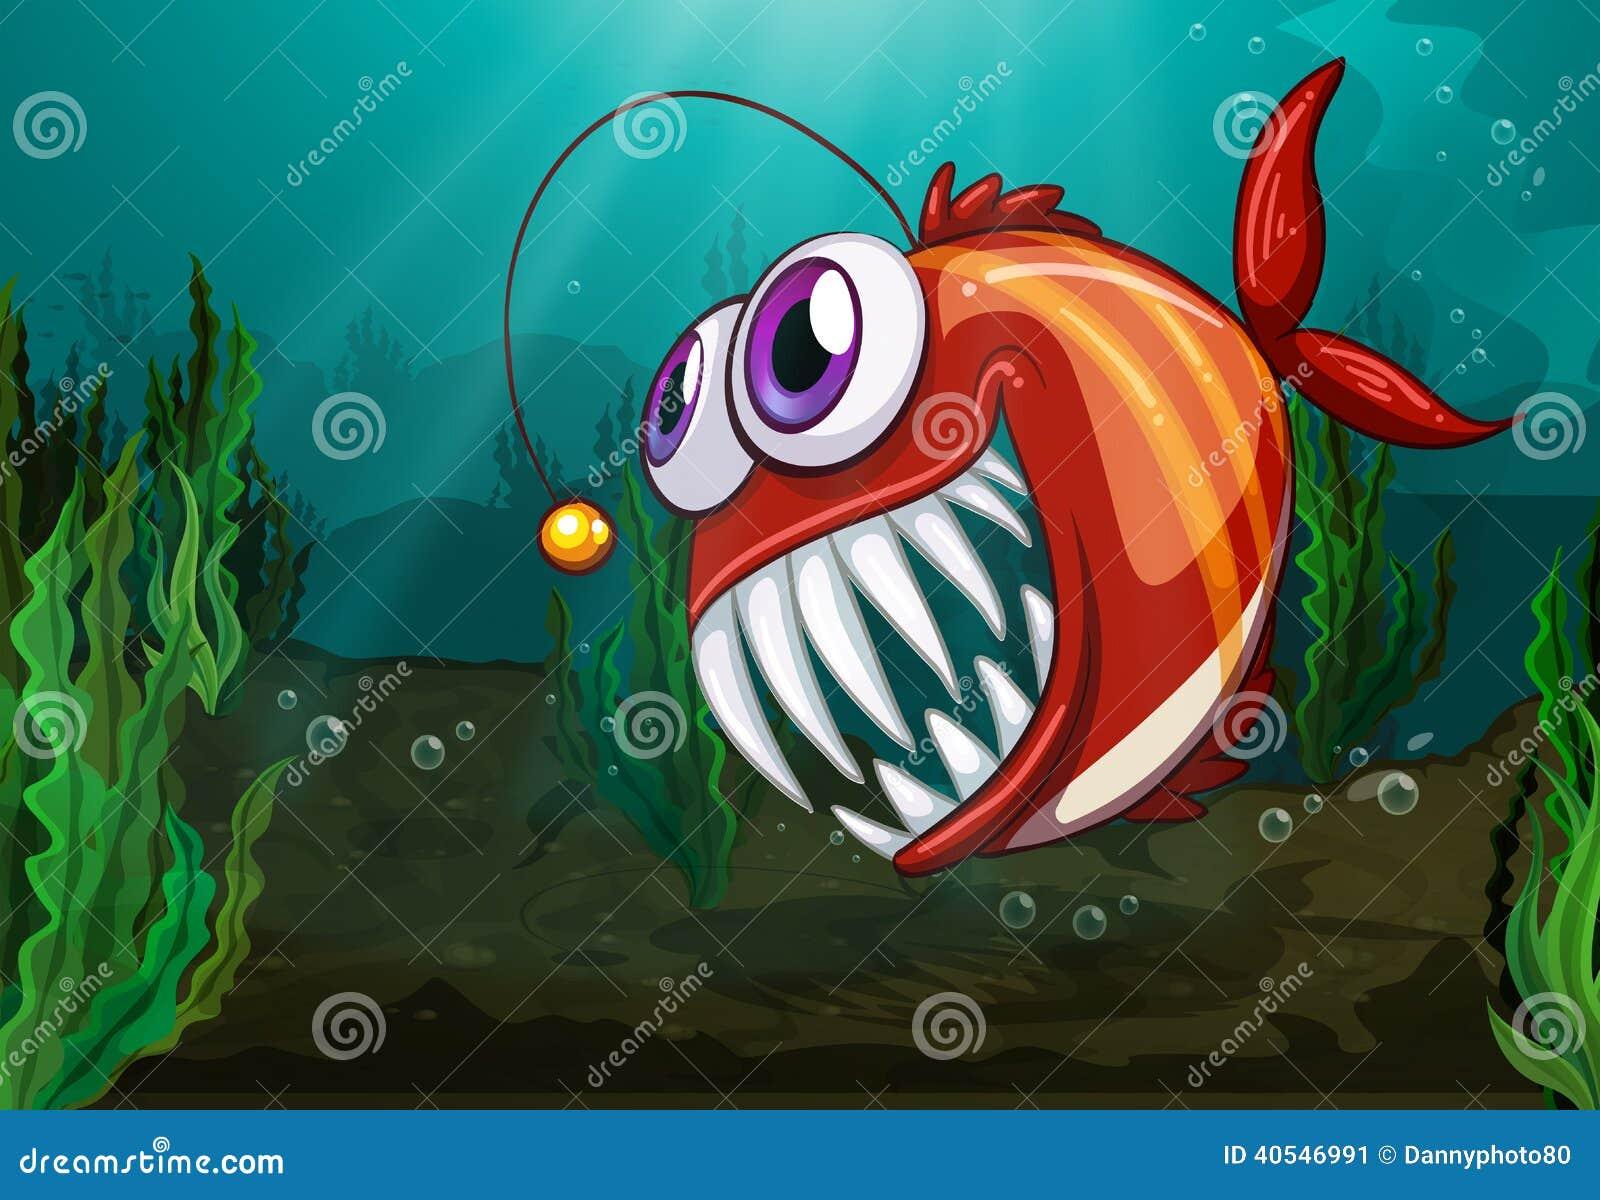 Stock Image Big Fish Under Sea Illustration Image40546991